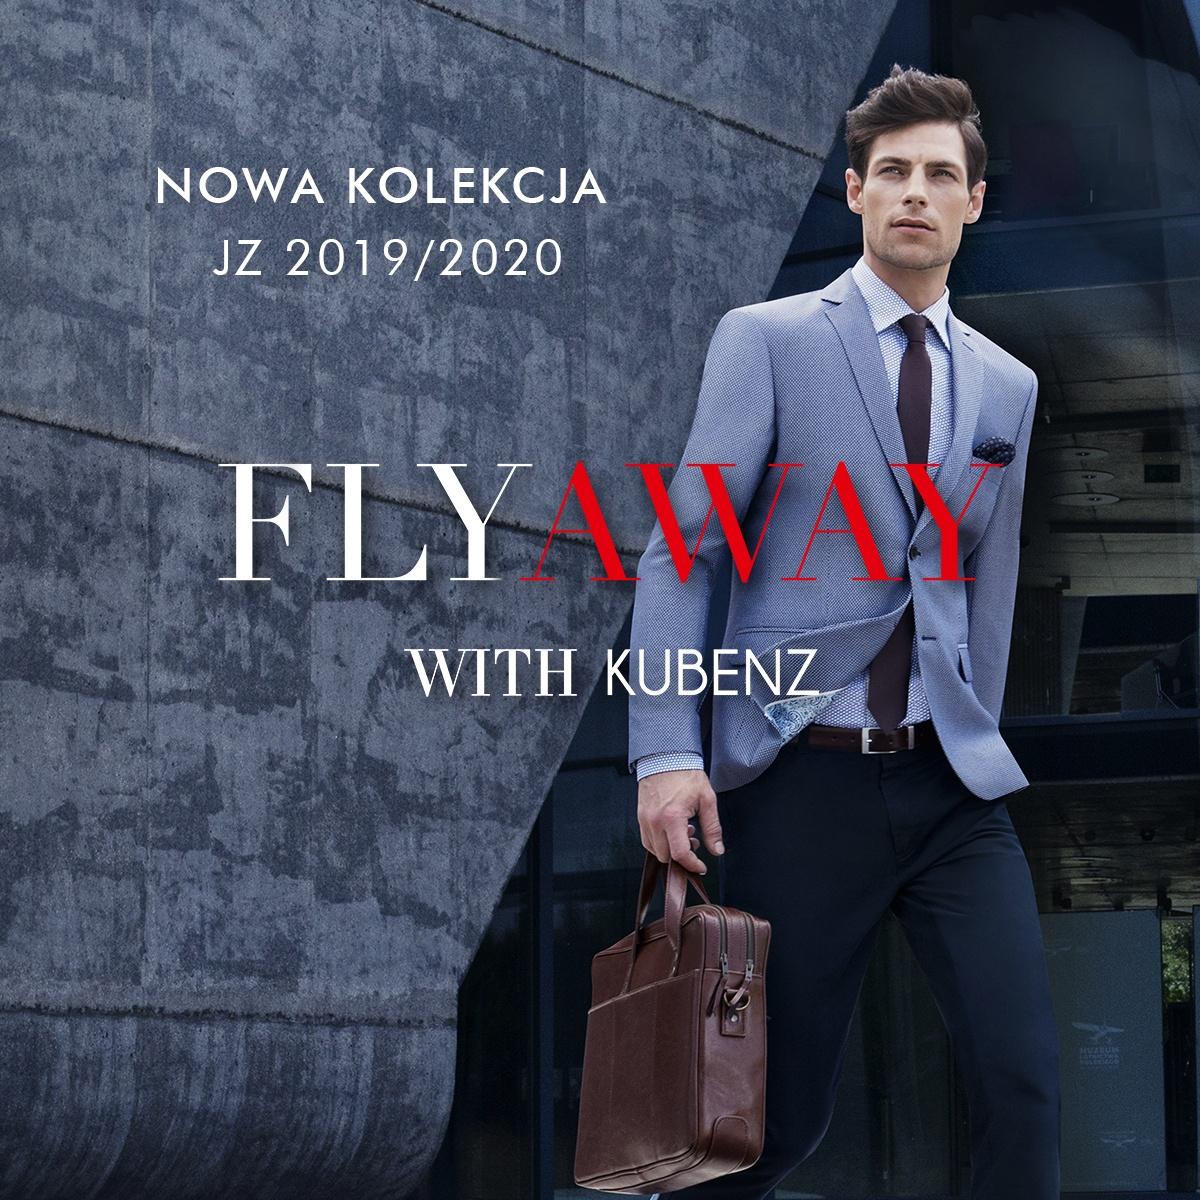 NOWA KOLEKCJA – FLYAWAY WITH KUBENZ!